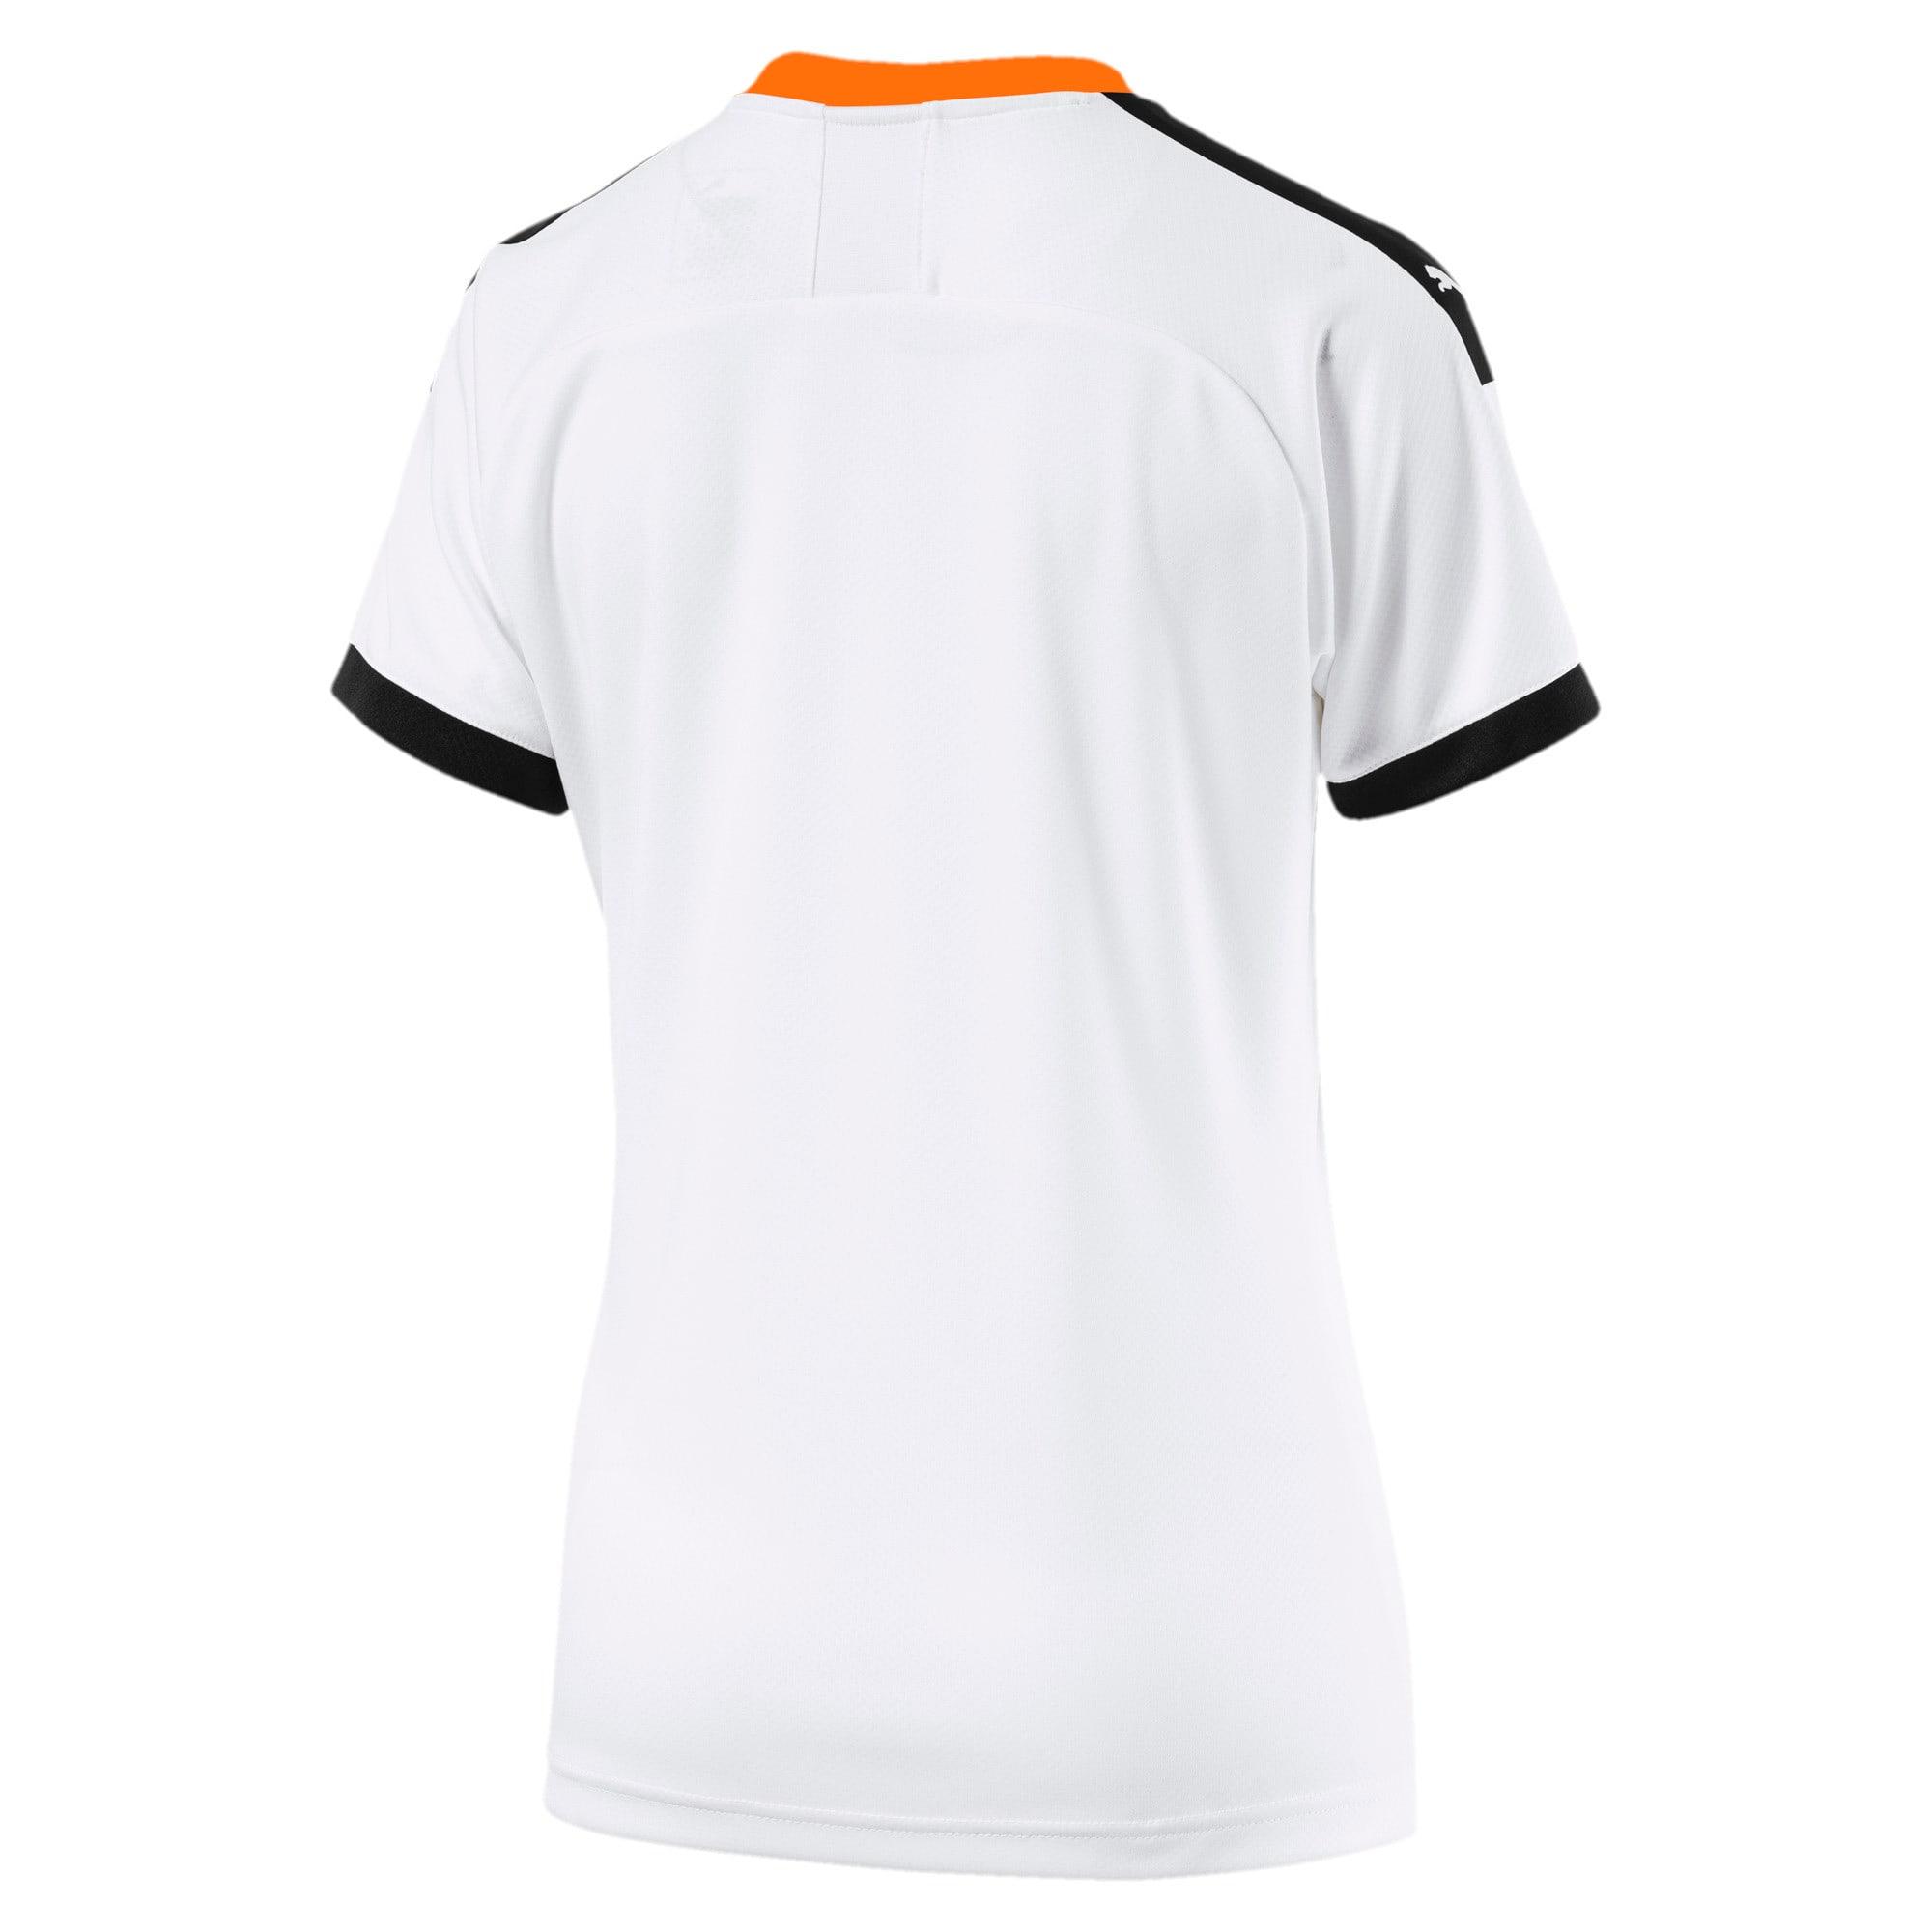 Thumbnail 2 of Valencia CF Women's Home Replica Jersey, White- Black-Vibrant Orange, medium